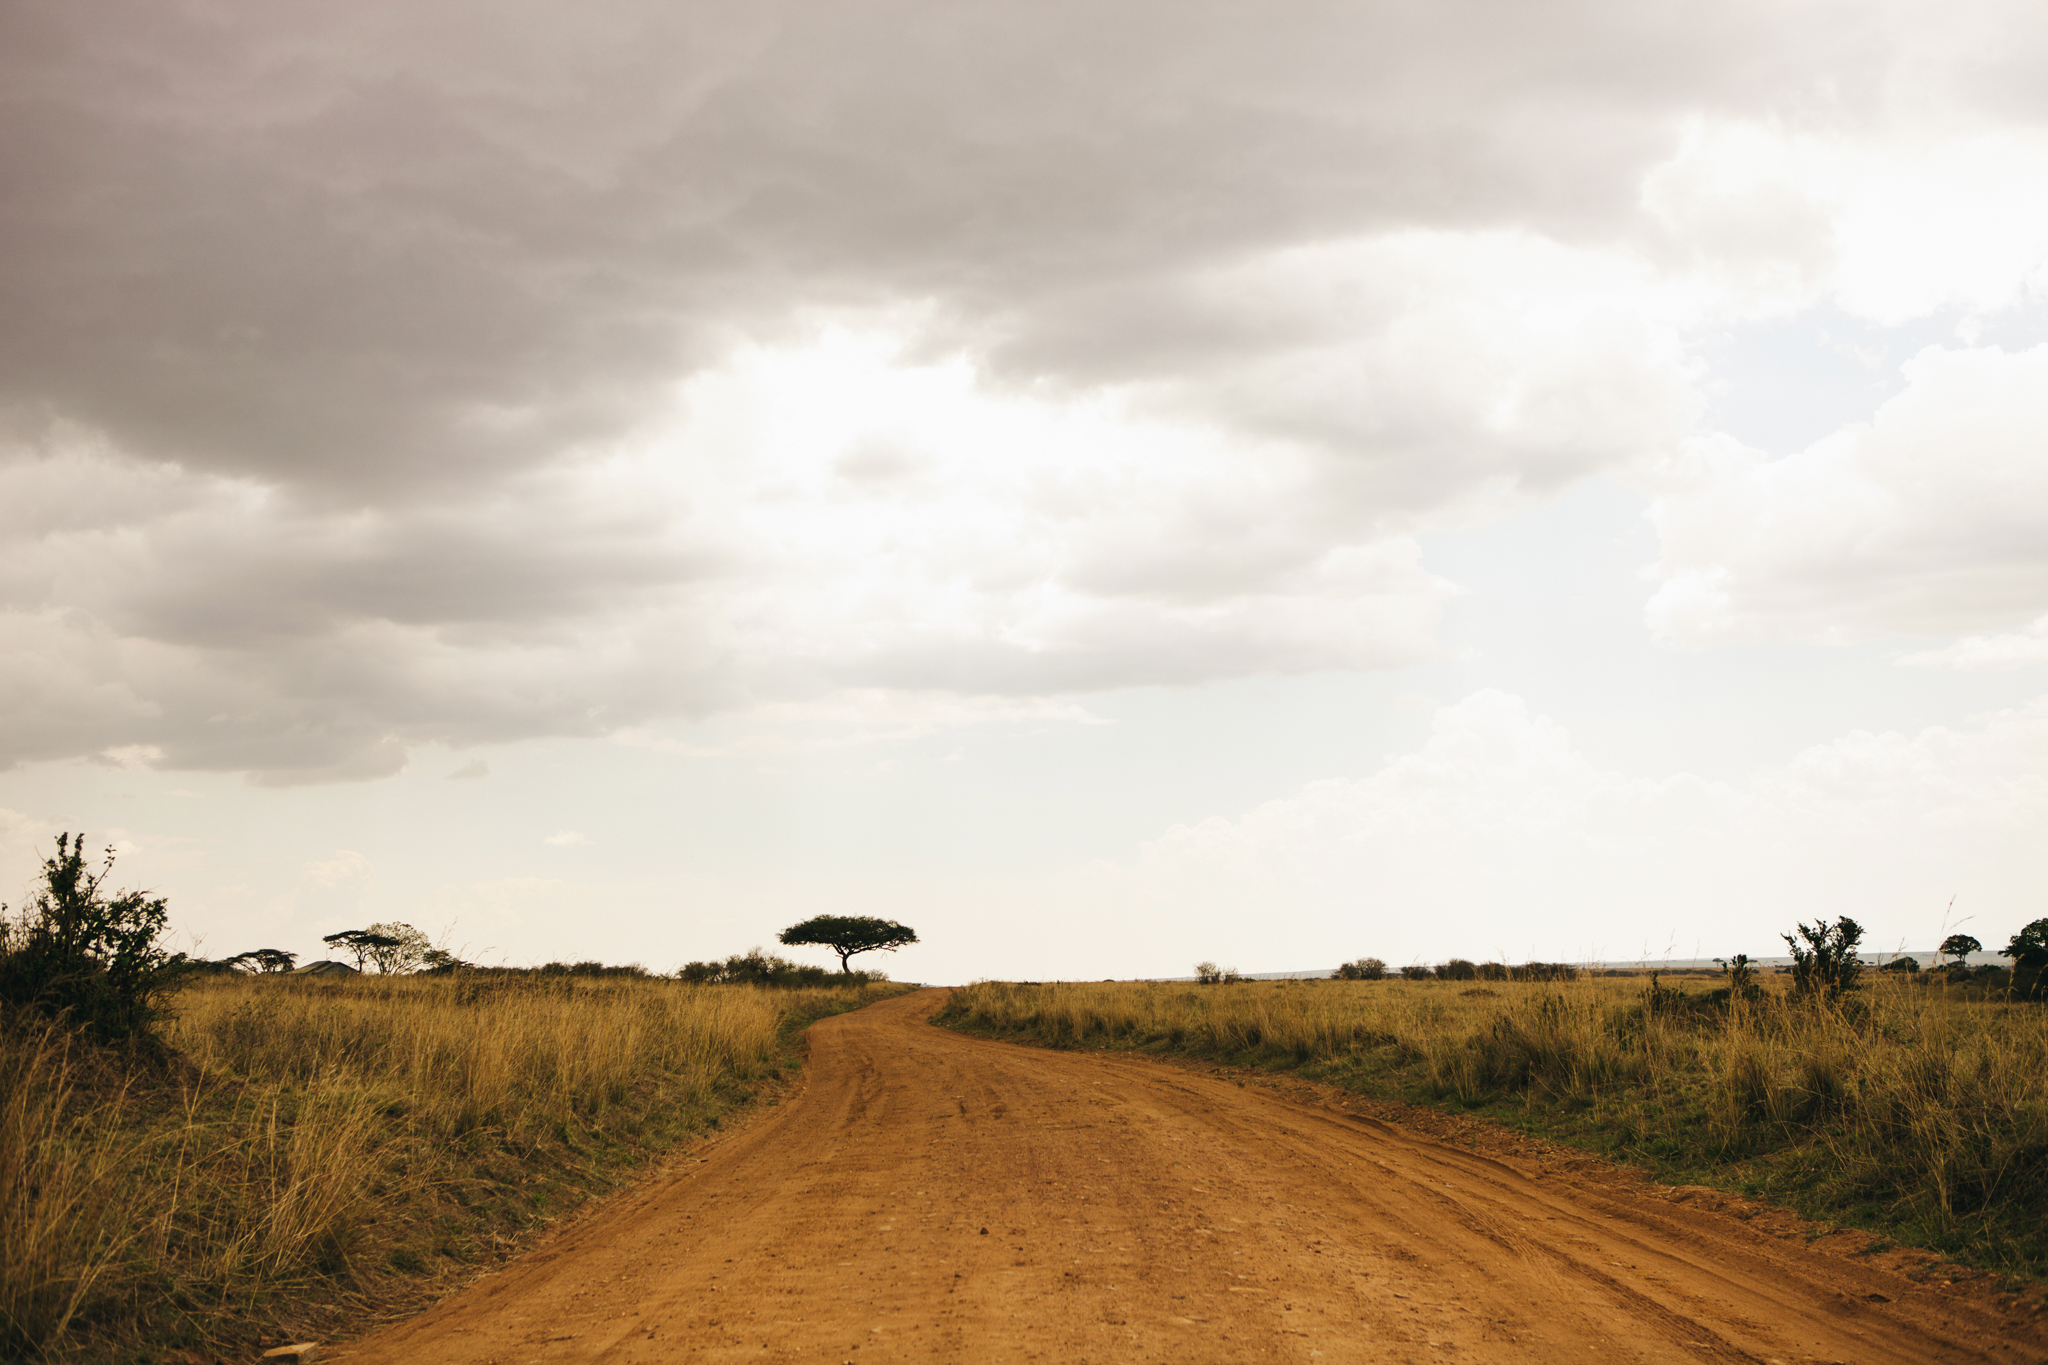 Kenya-69.jpg